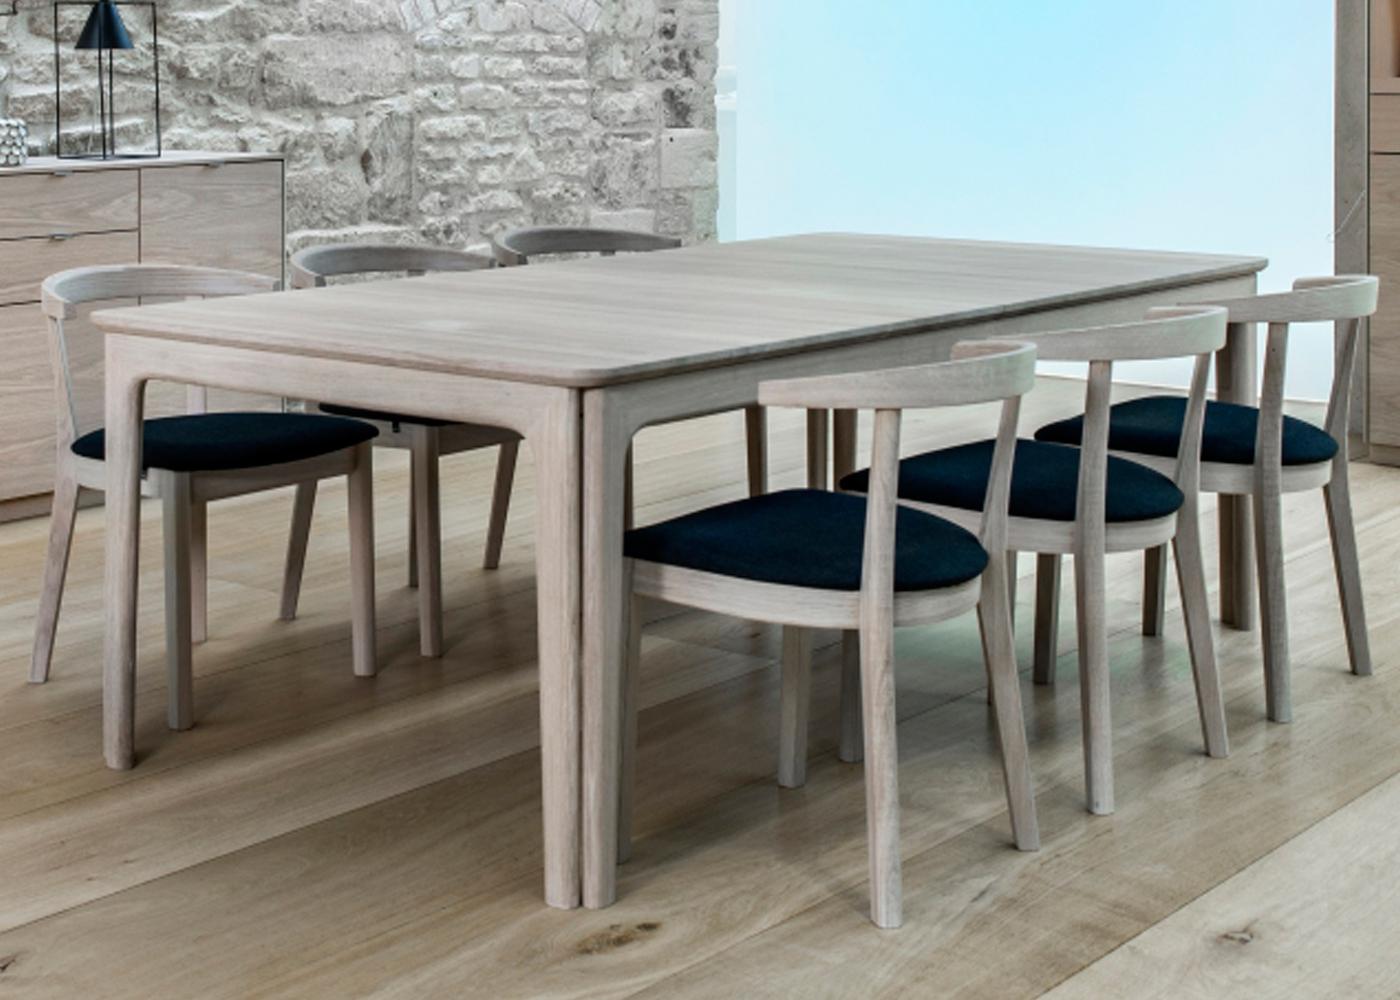 Skovby sm27 Dining Table  Midfurn Furniture Superstore